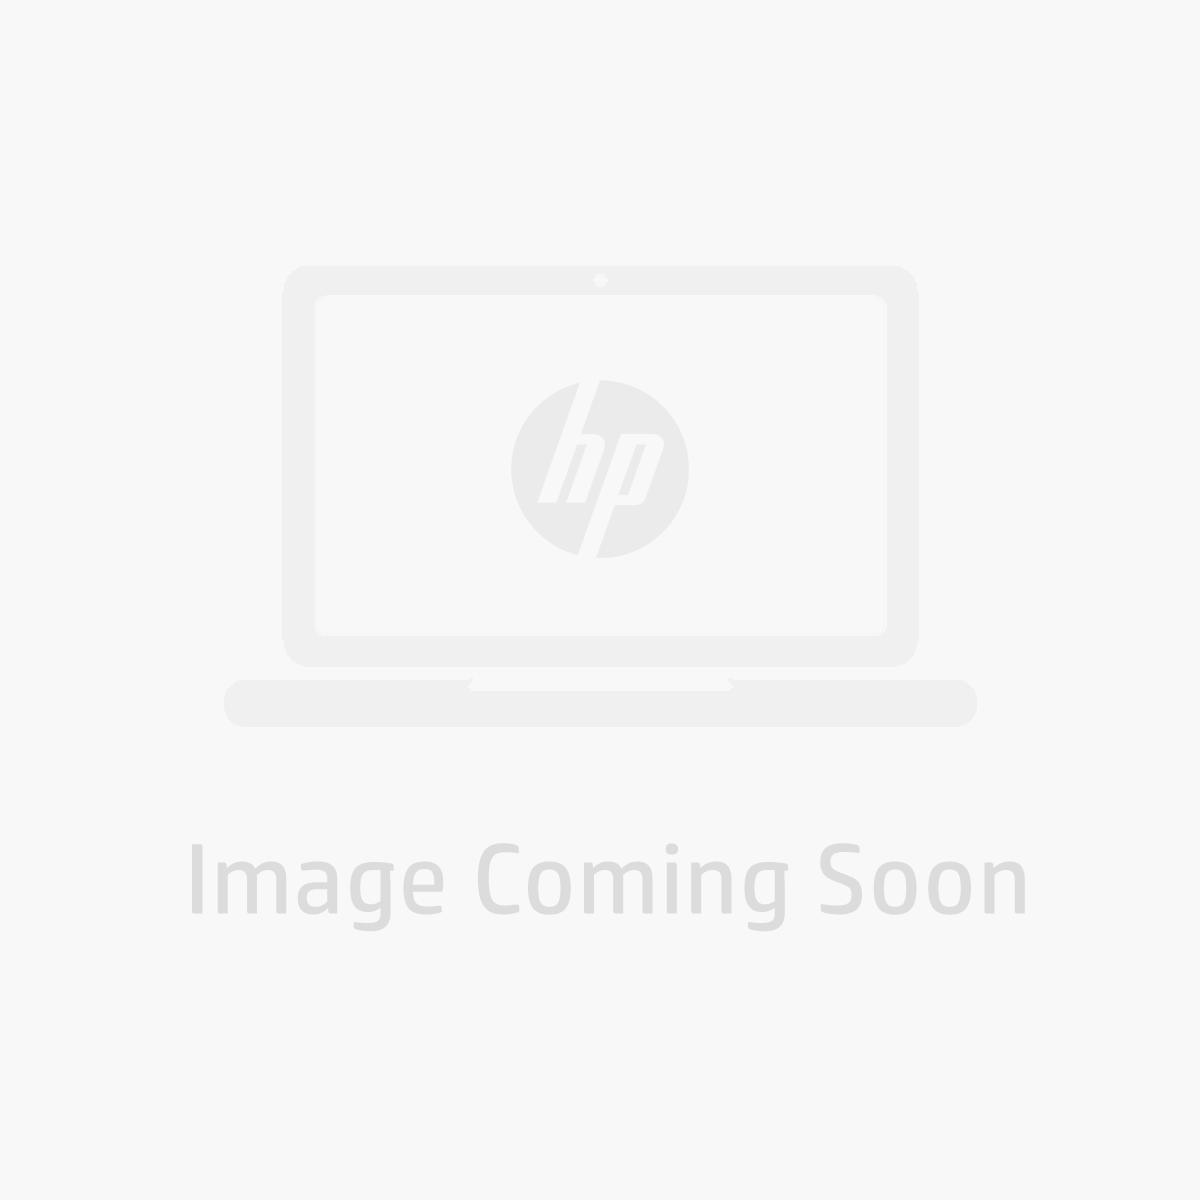 HP 285 Desktop Ryzen 3-2200G in Black